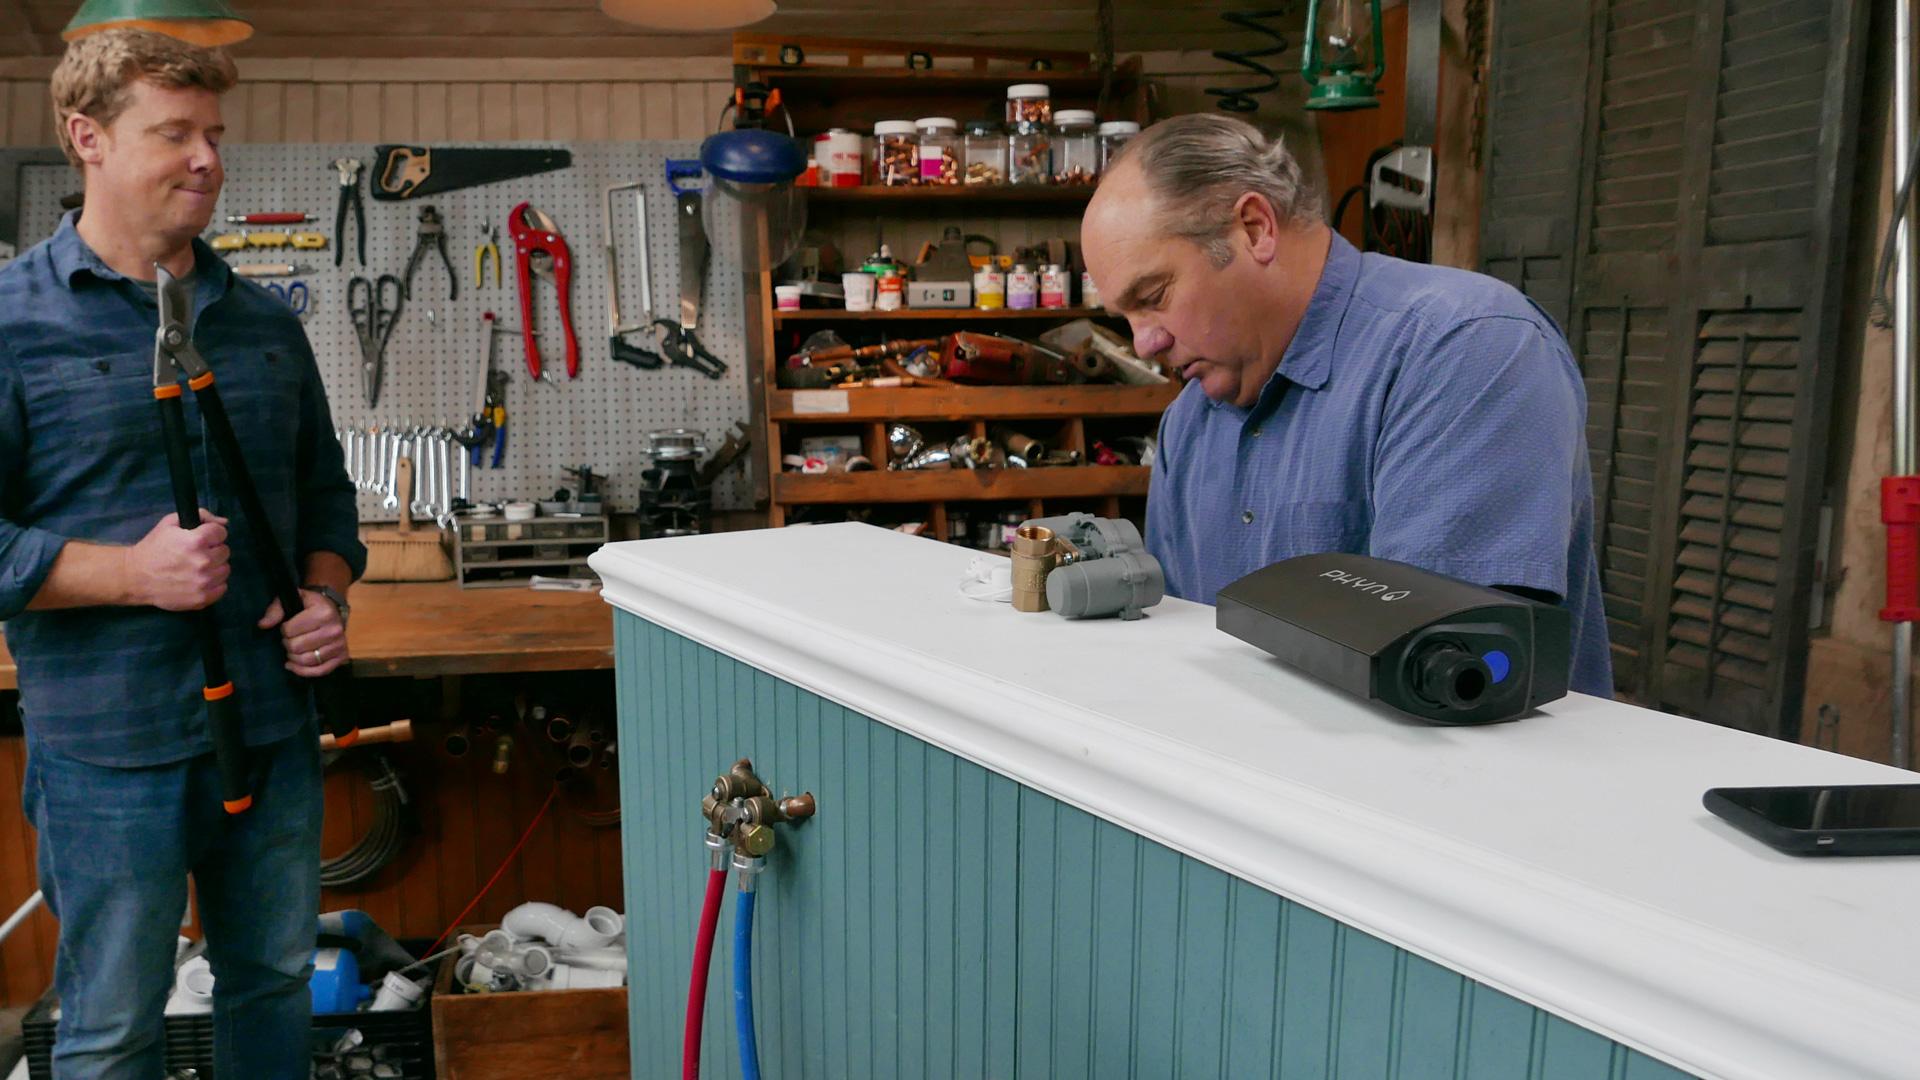 Richard Trethewey tests smart automatic water shut off valves.